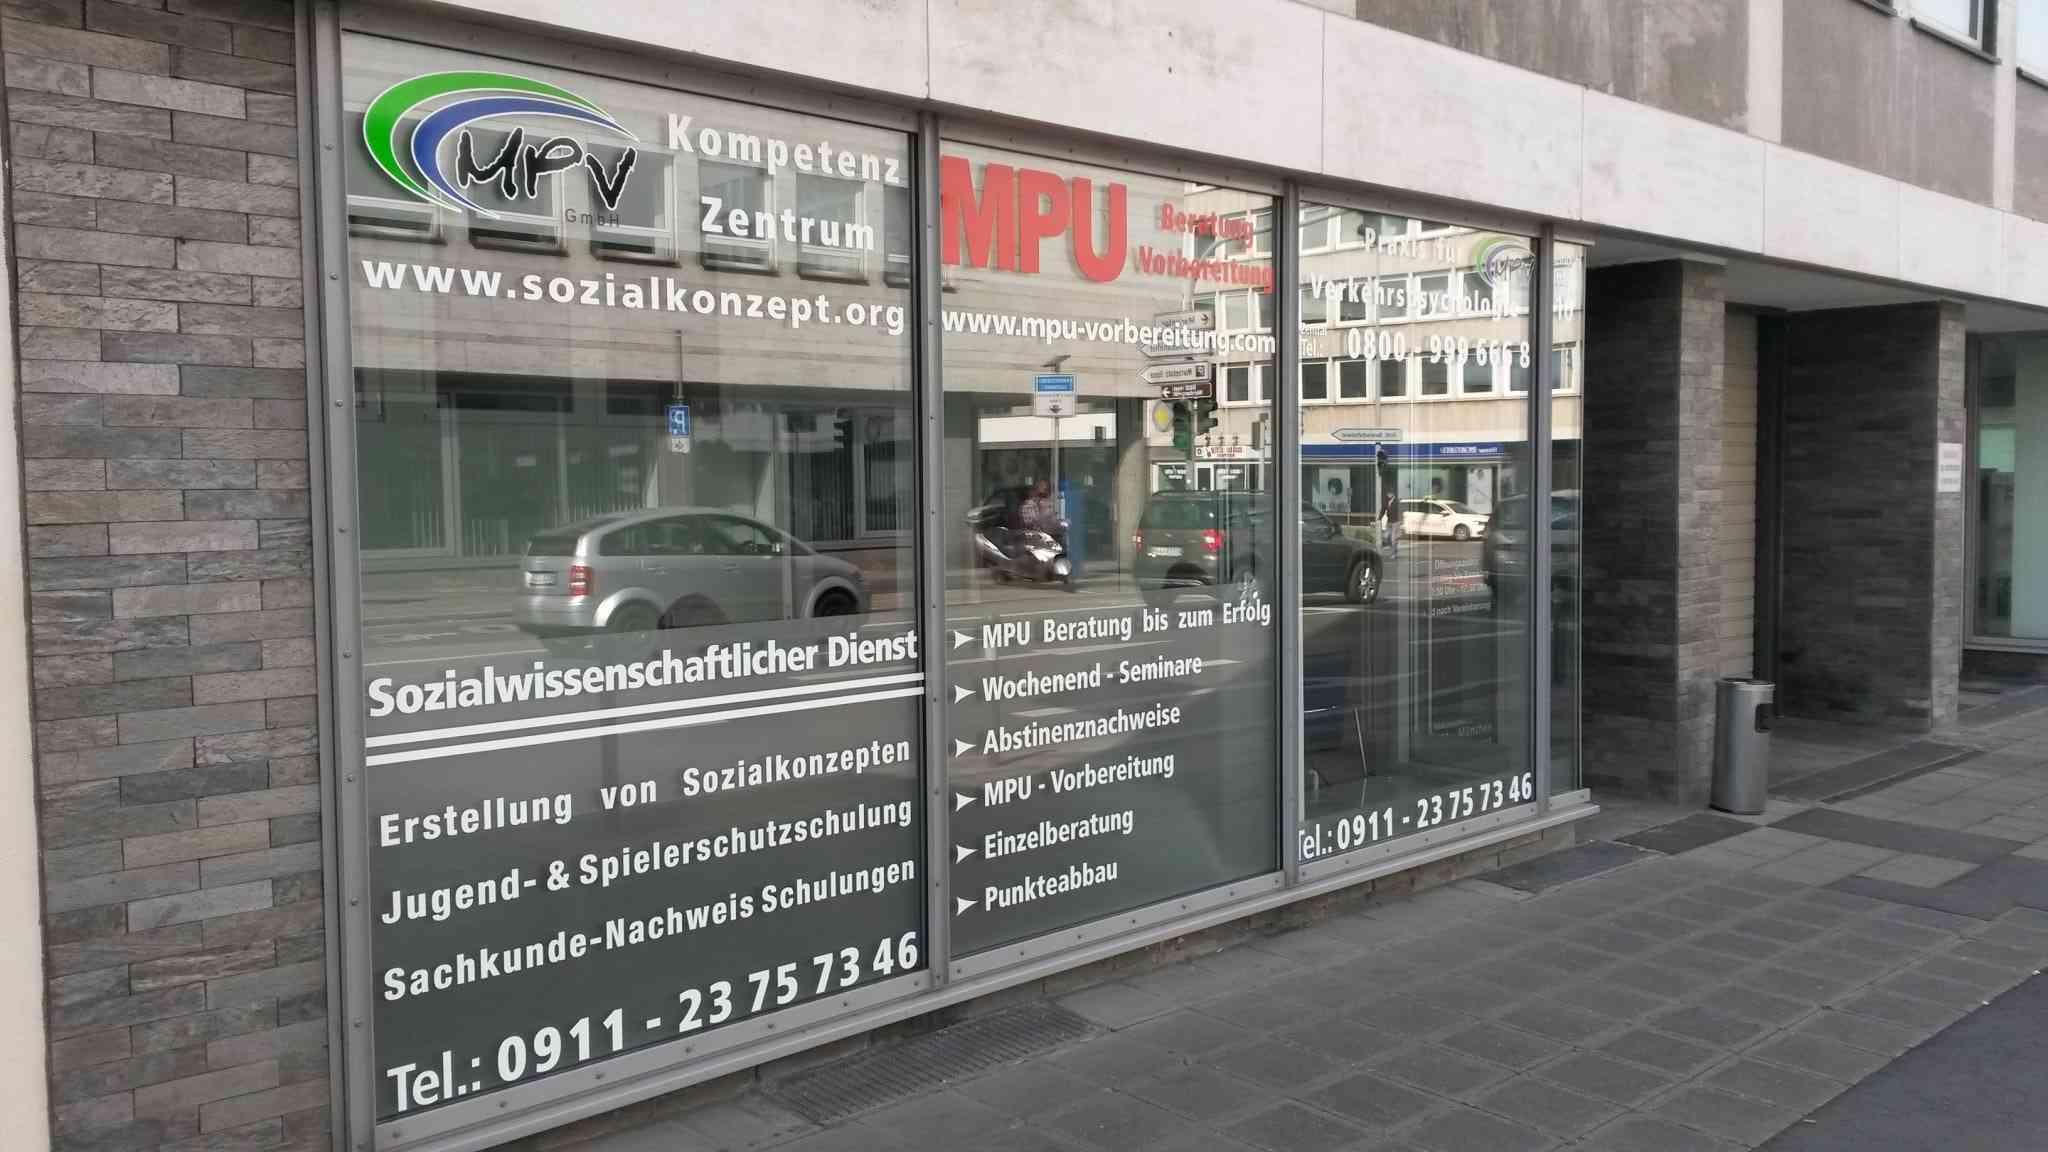 MPU Vorbereitungsstelle in Nürnberg